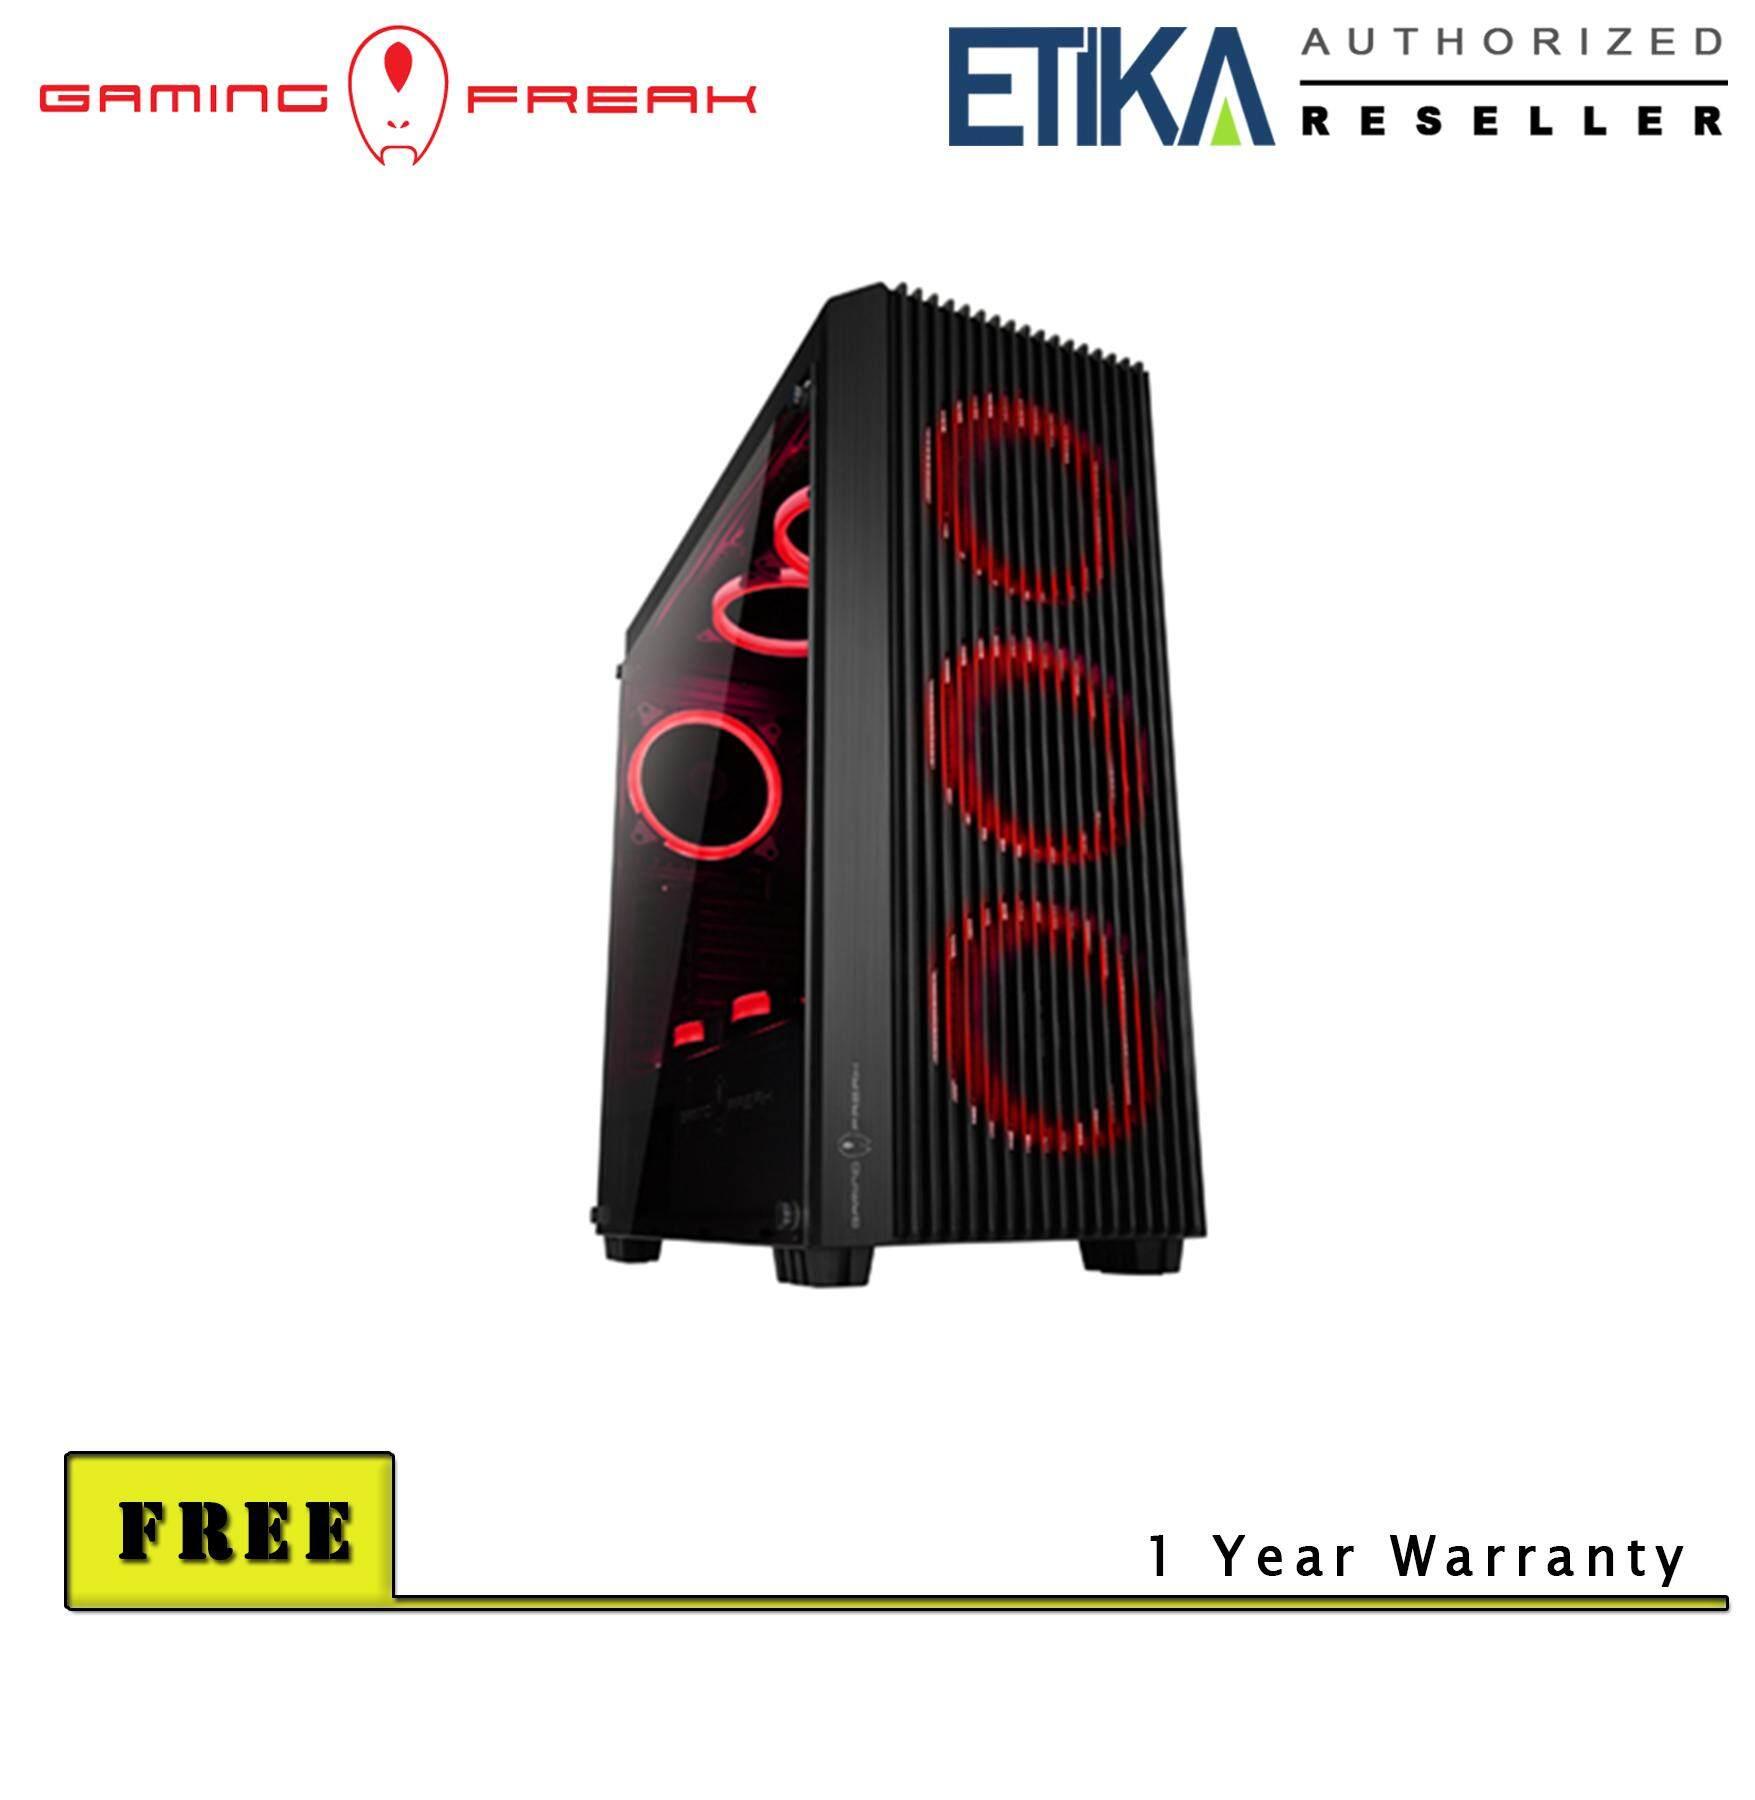 Gaming Freak Thor XV700G Premium Middle Tower Case Malaysia